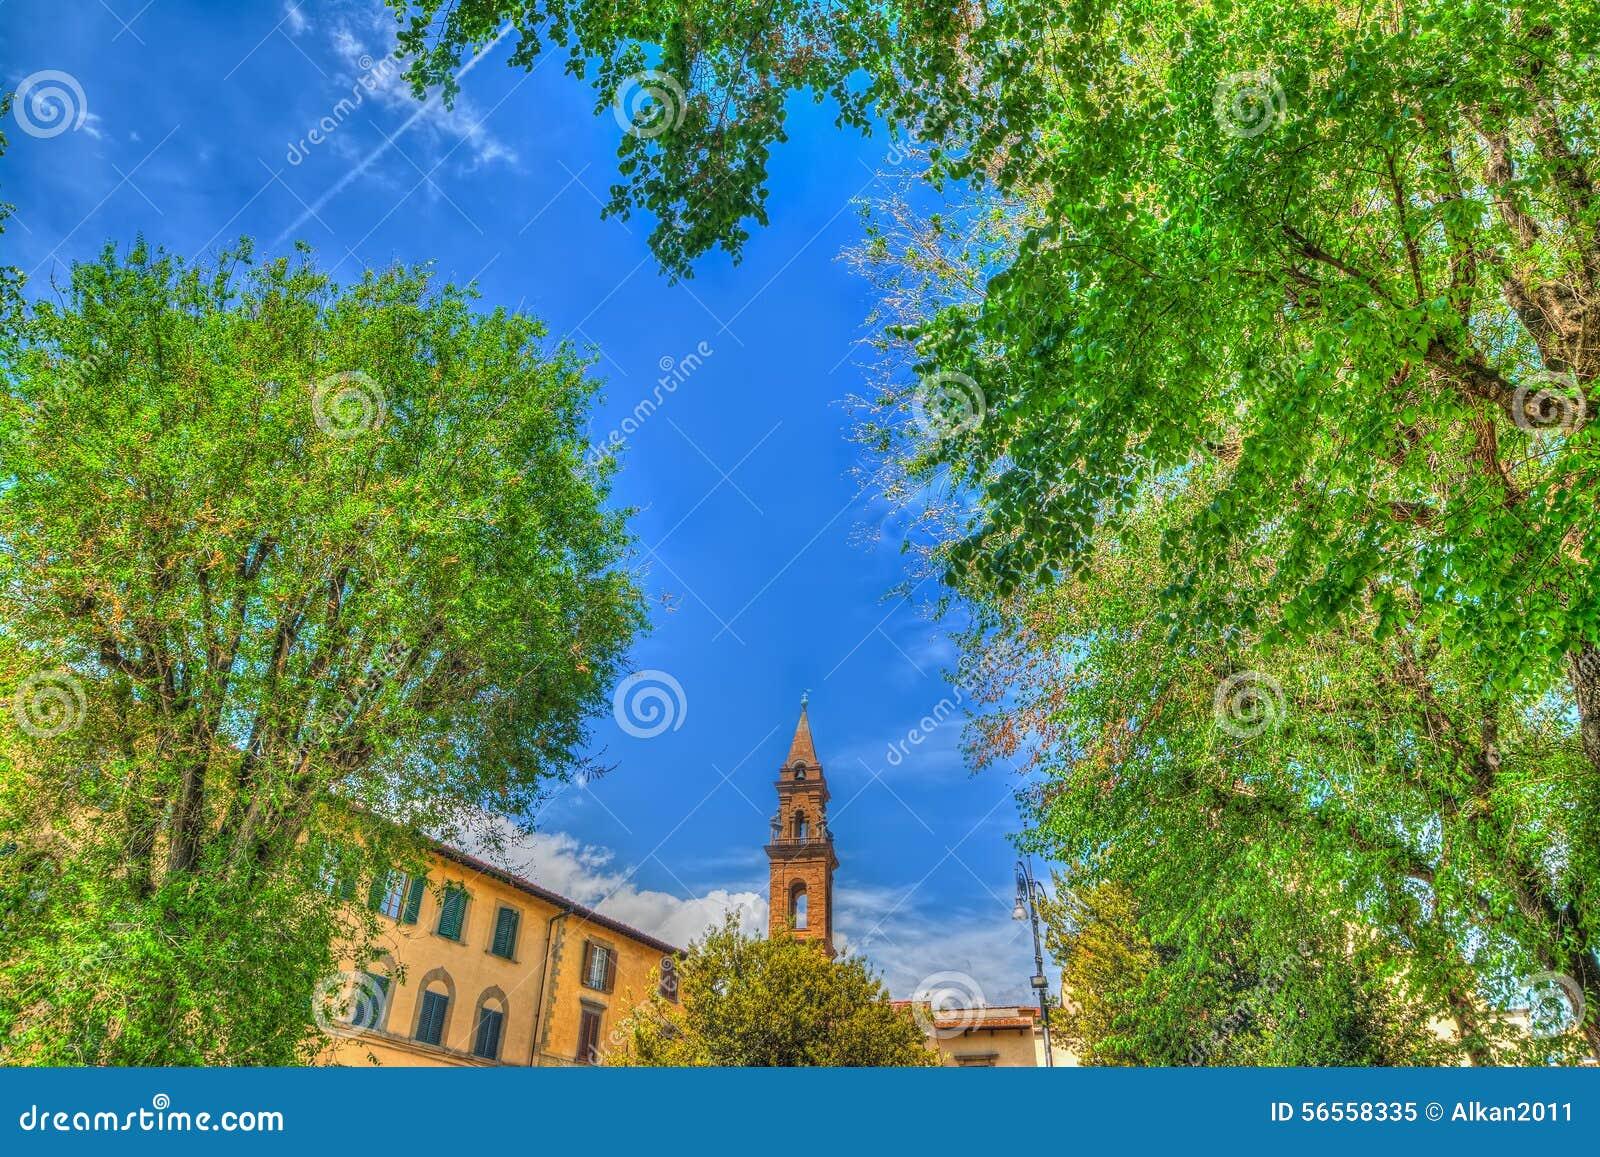 Download Καμπαναριό Spirito Santo που βλέπει μέσω των πράσινων δέντρων Στοκ Εικόνα - εικόνα από κτήμα, antiquate: 56558335